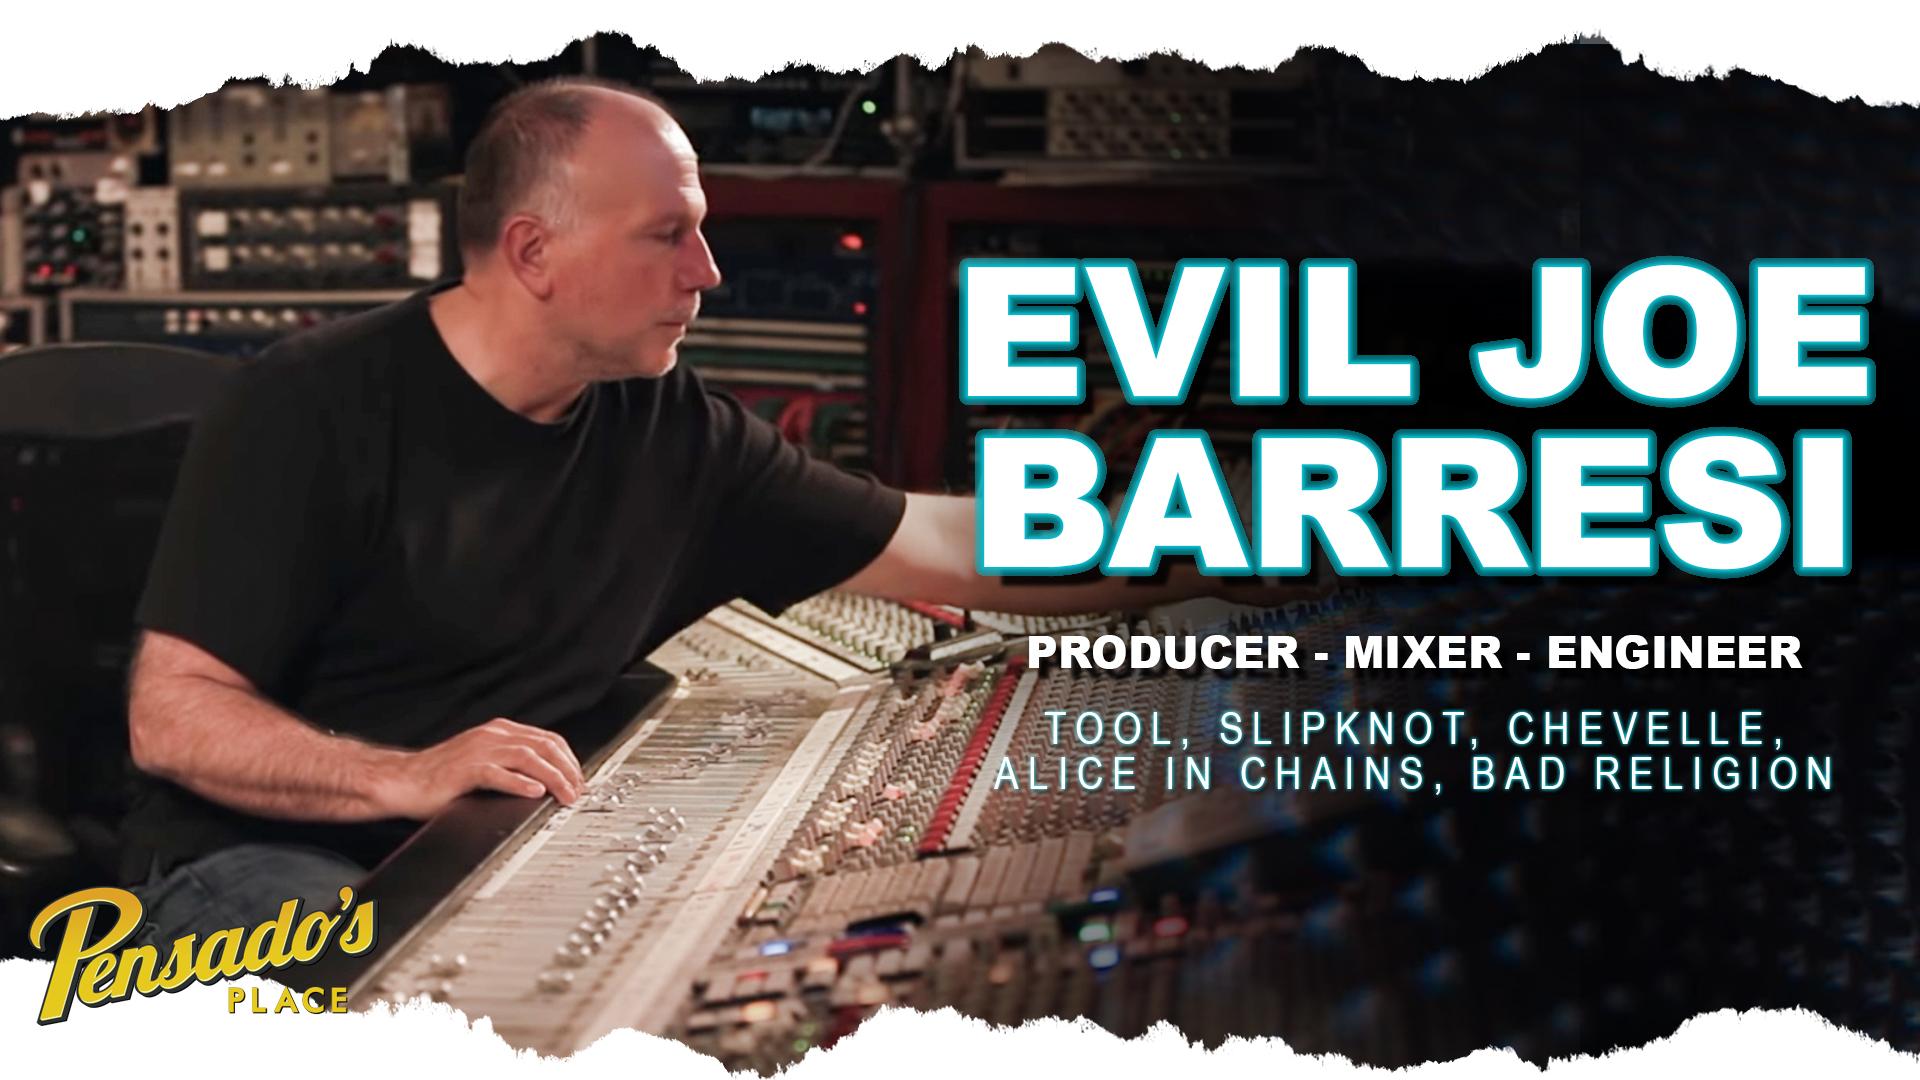 Producer / Mixer / Engineer, Joe Barresi (Tool, Slipknot) PART 2